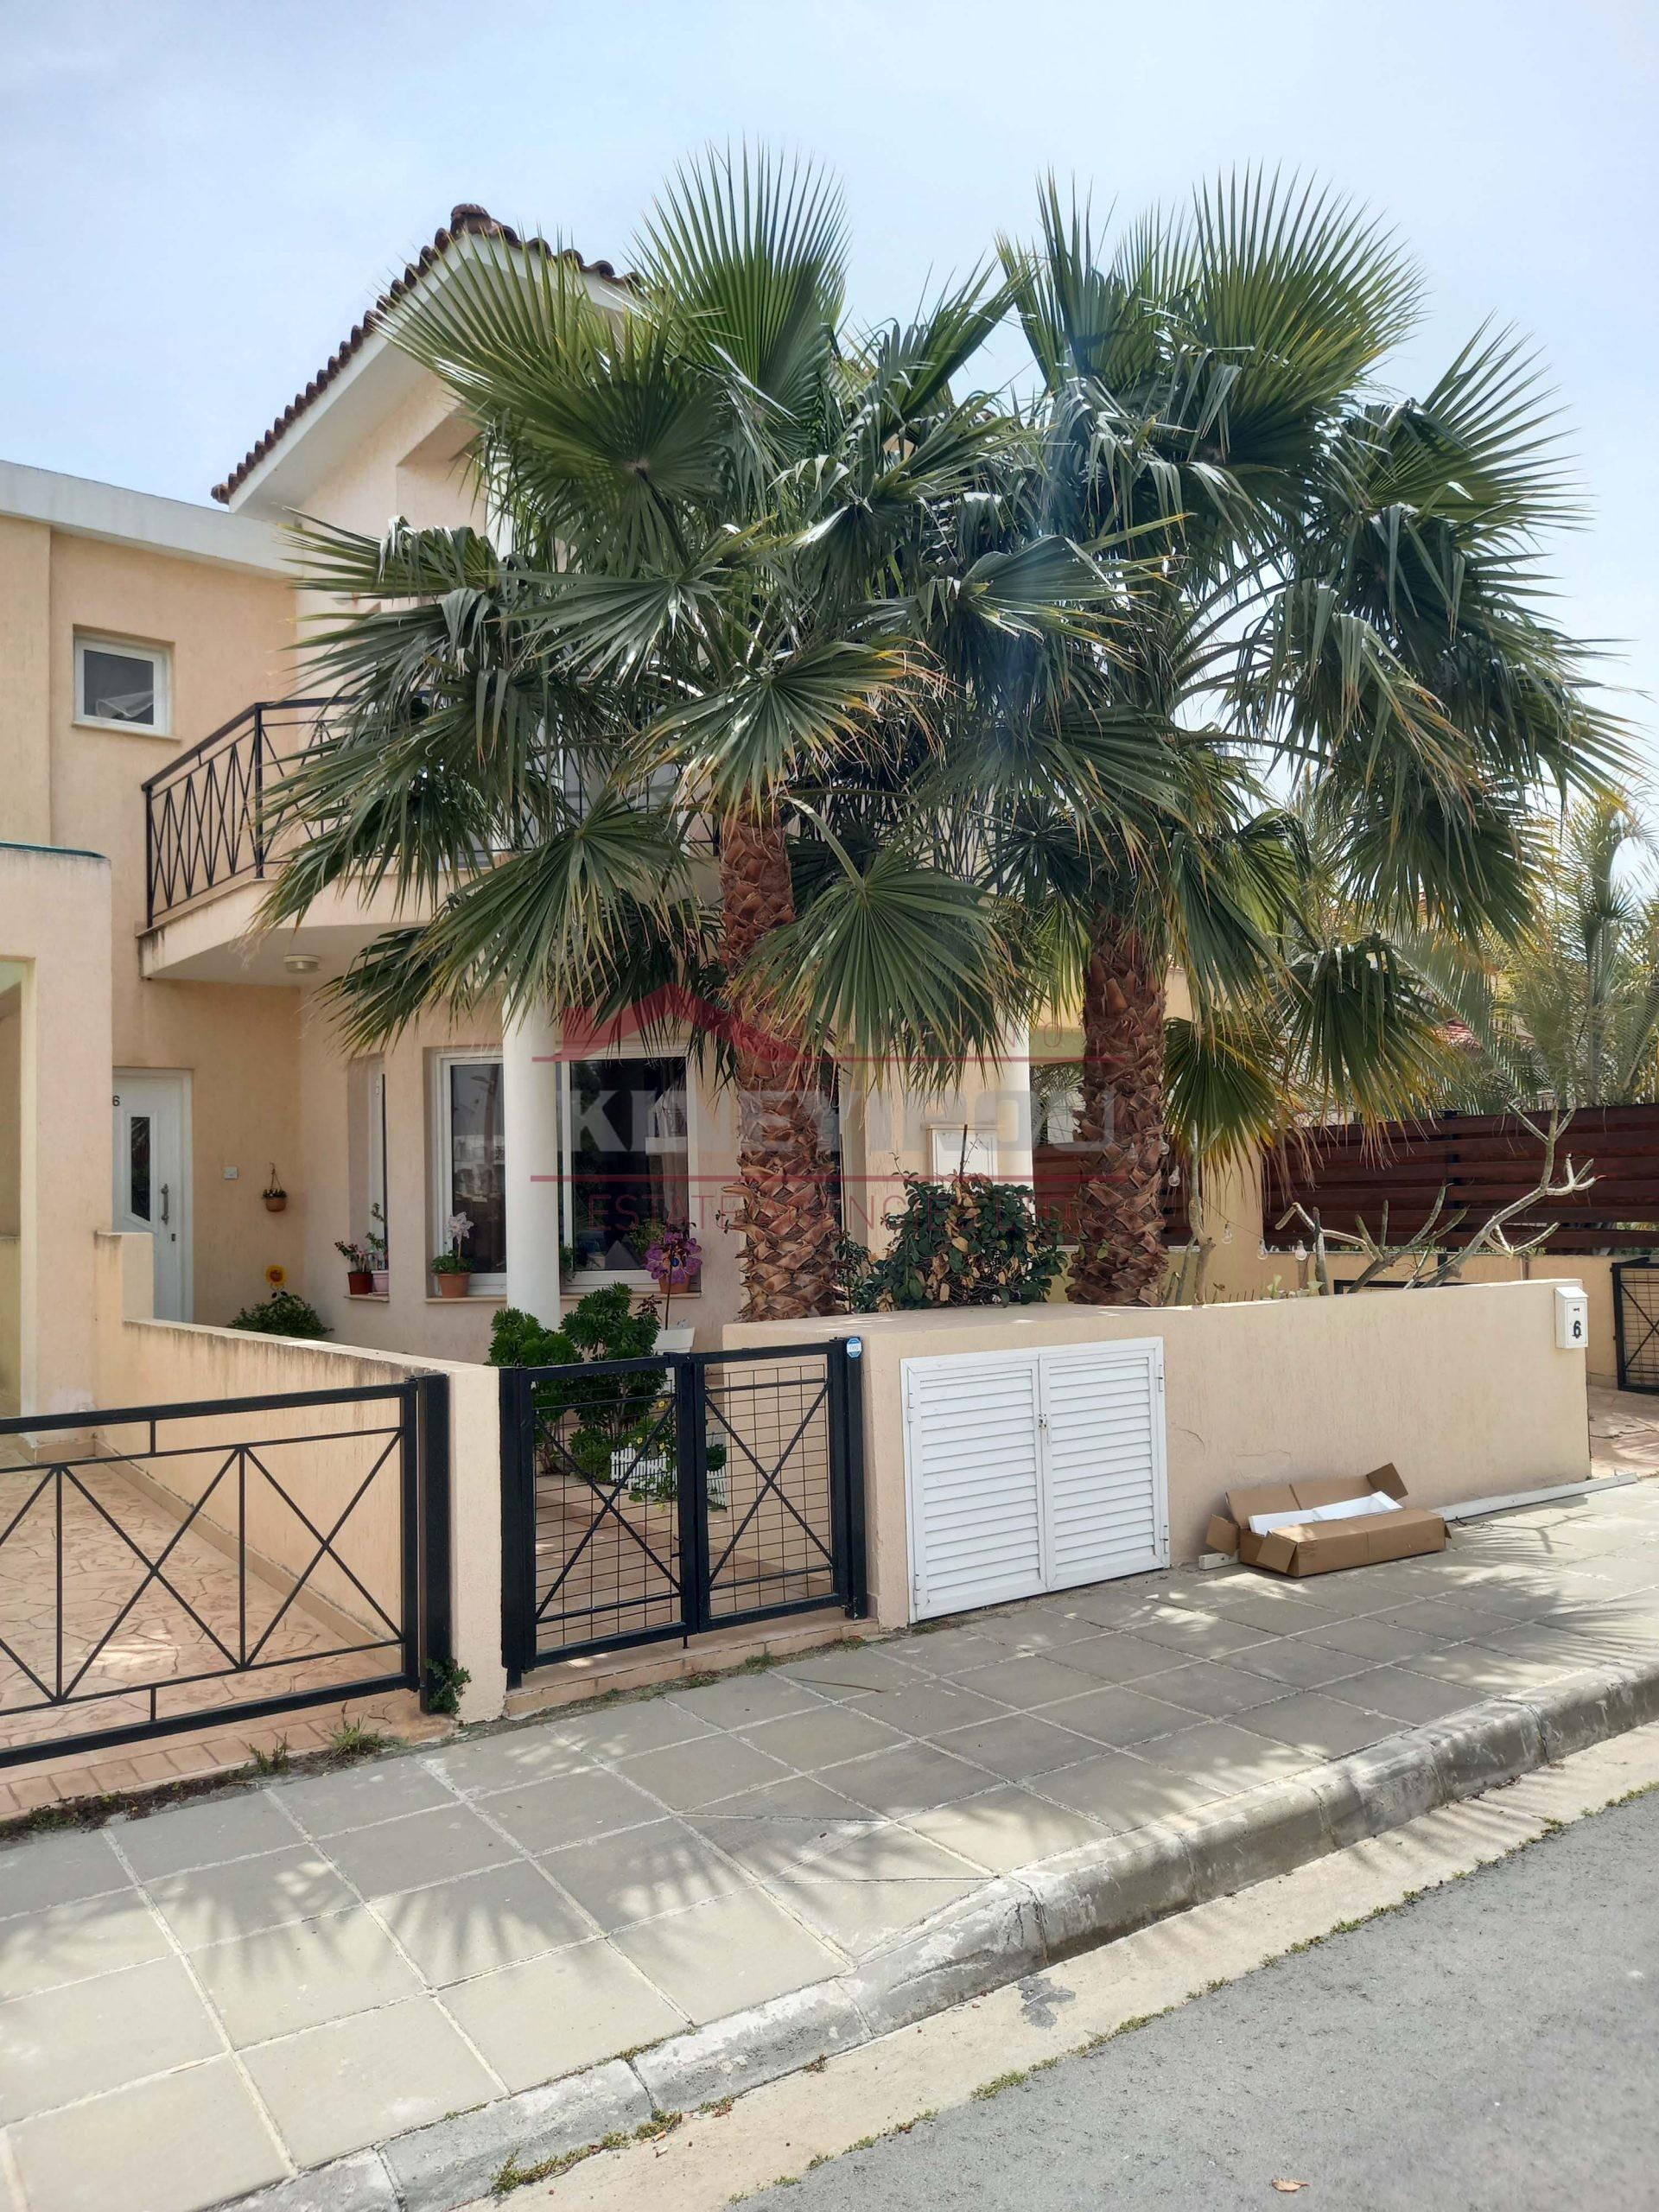 3 Bedroom house in Dhekelia, Larnaca